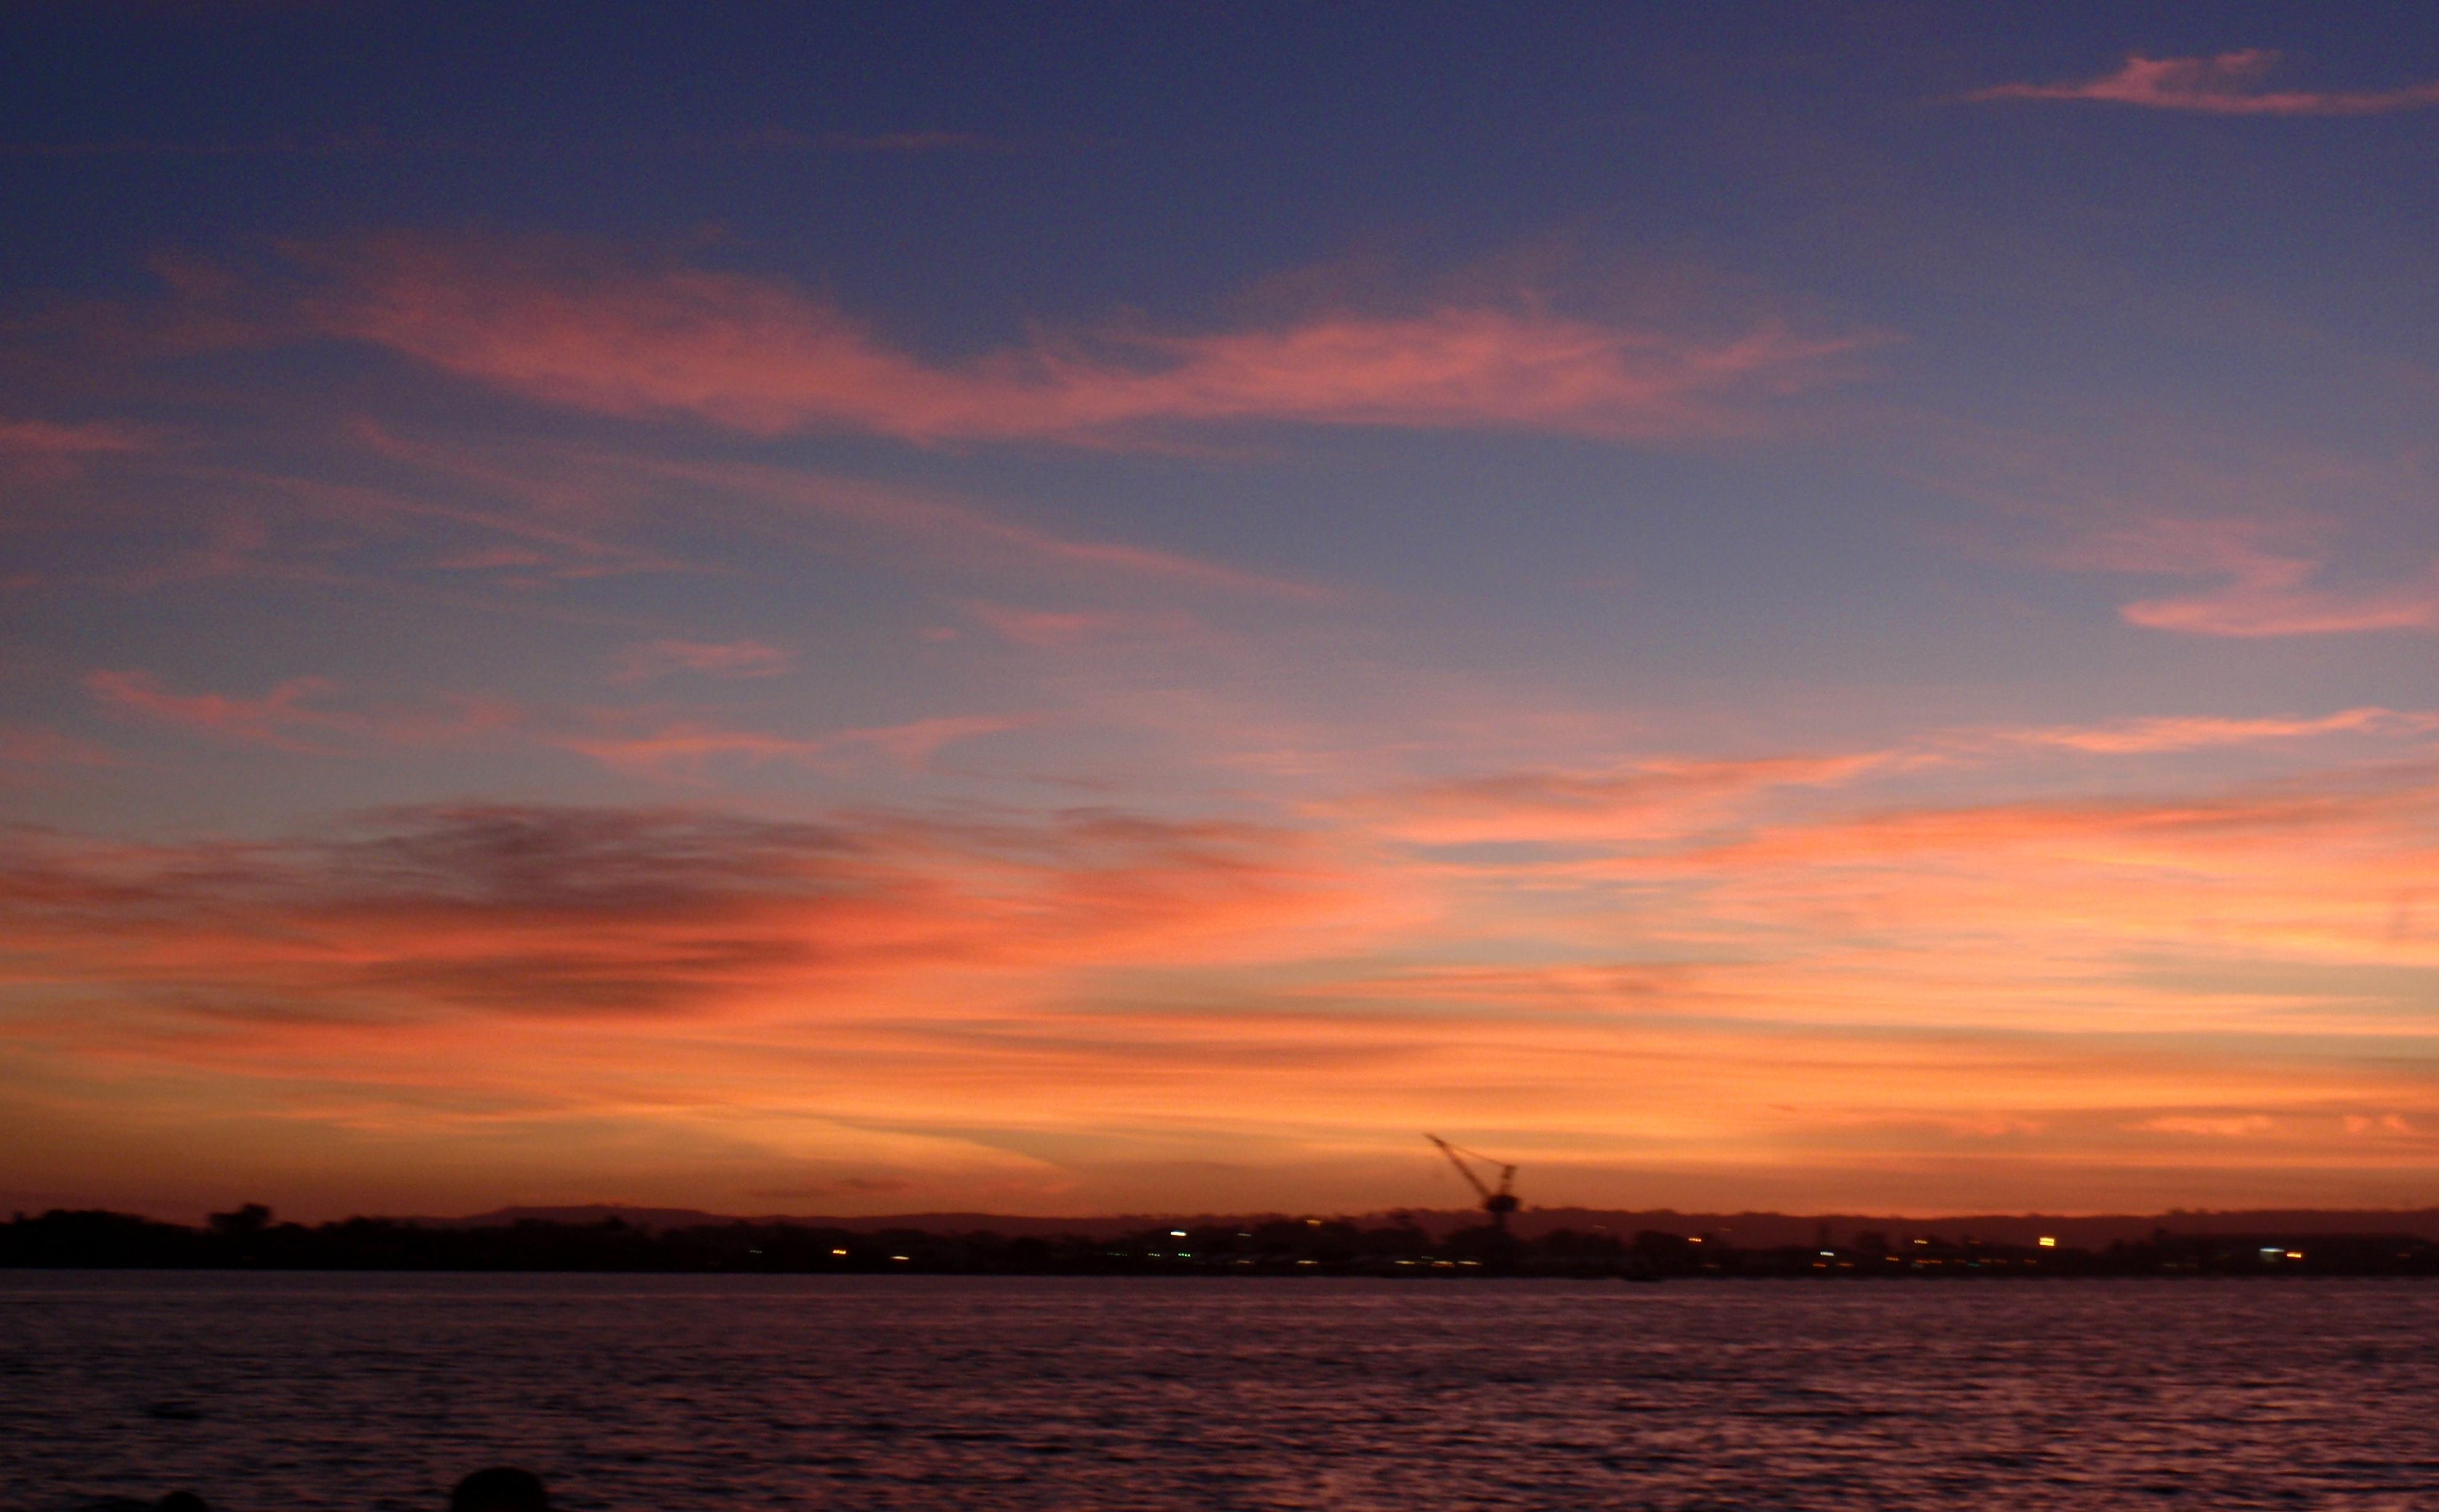 San Diego - Sunset over Coronado Island across the harbor - Photo by James Ulvog.